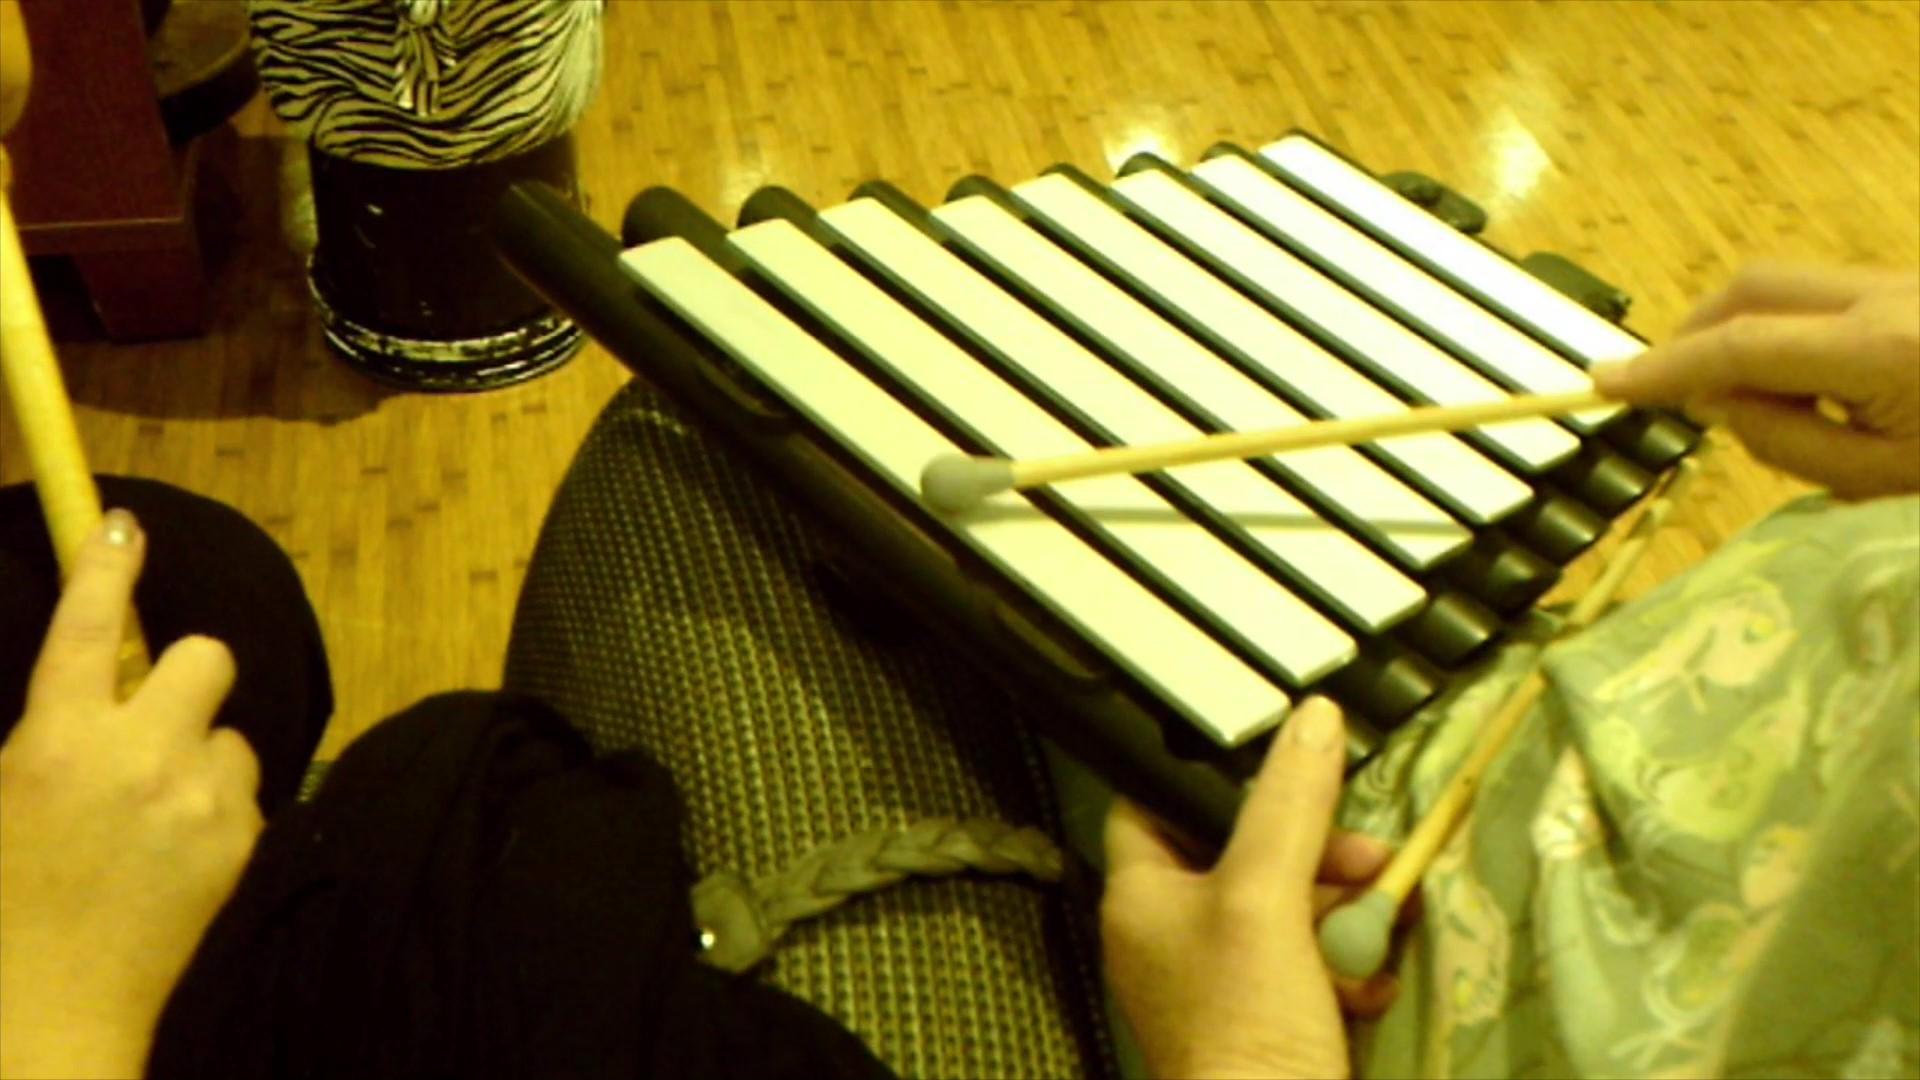 NET Chicago Drum Free Note_Moment.jpg